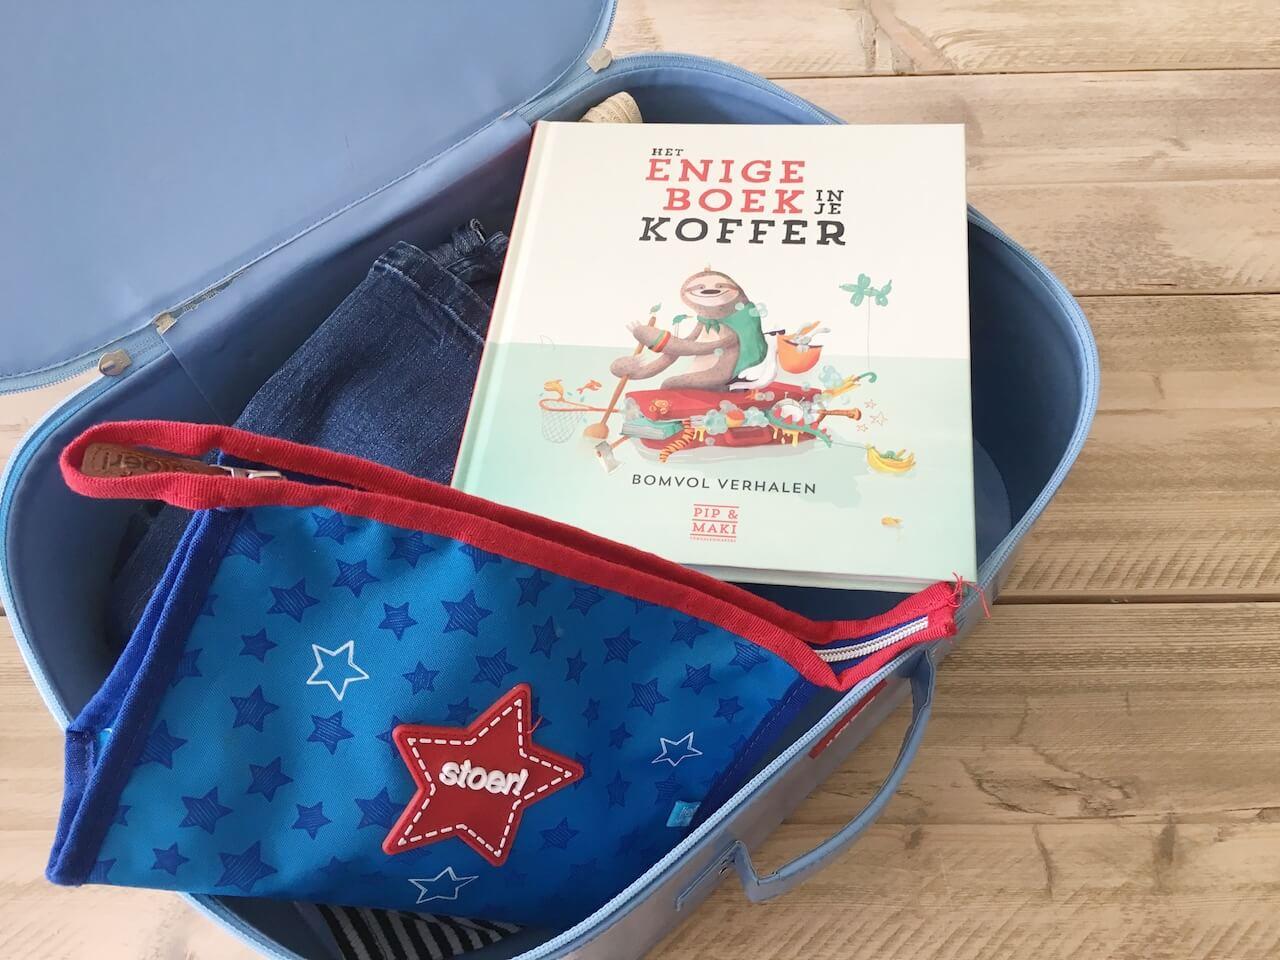 het enige boek in je koffer 4 - Het enige boek in je koffer!